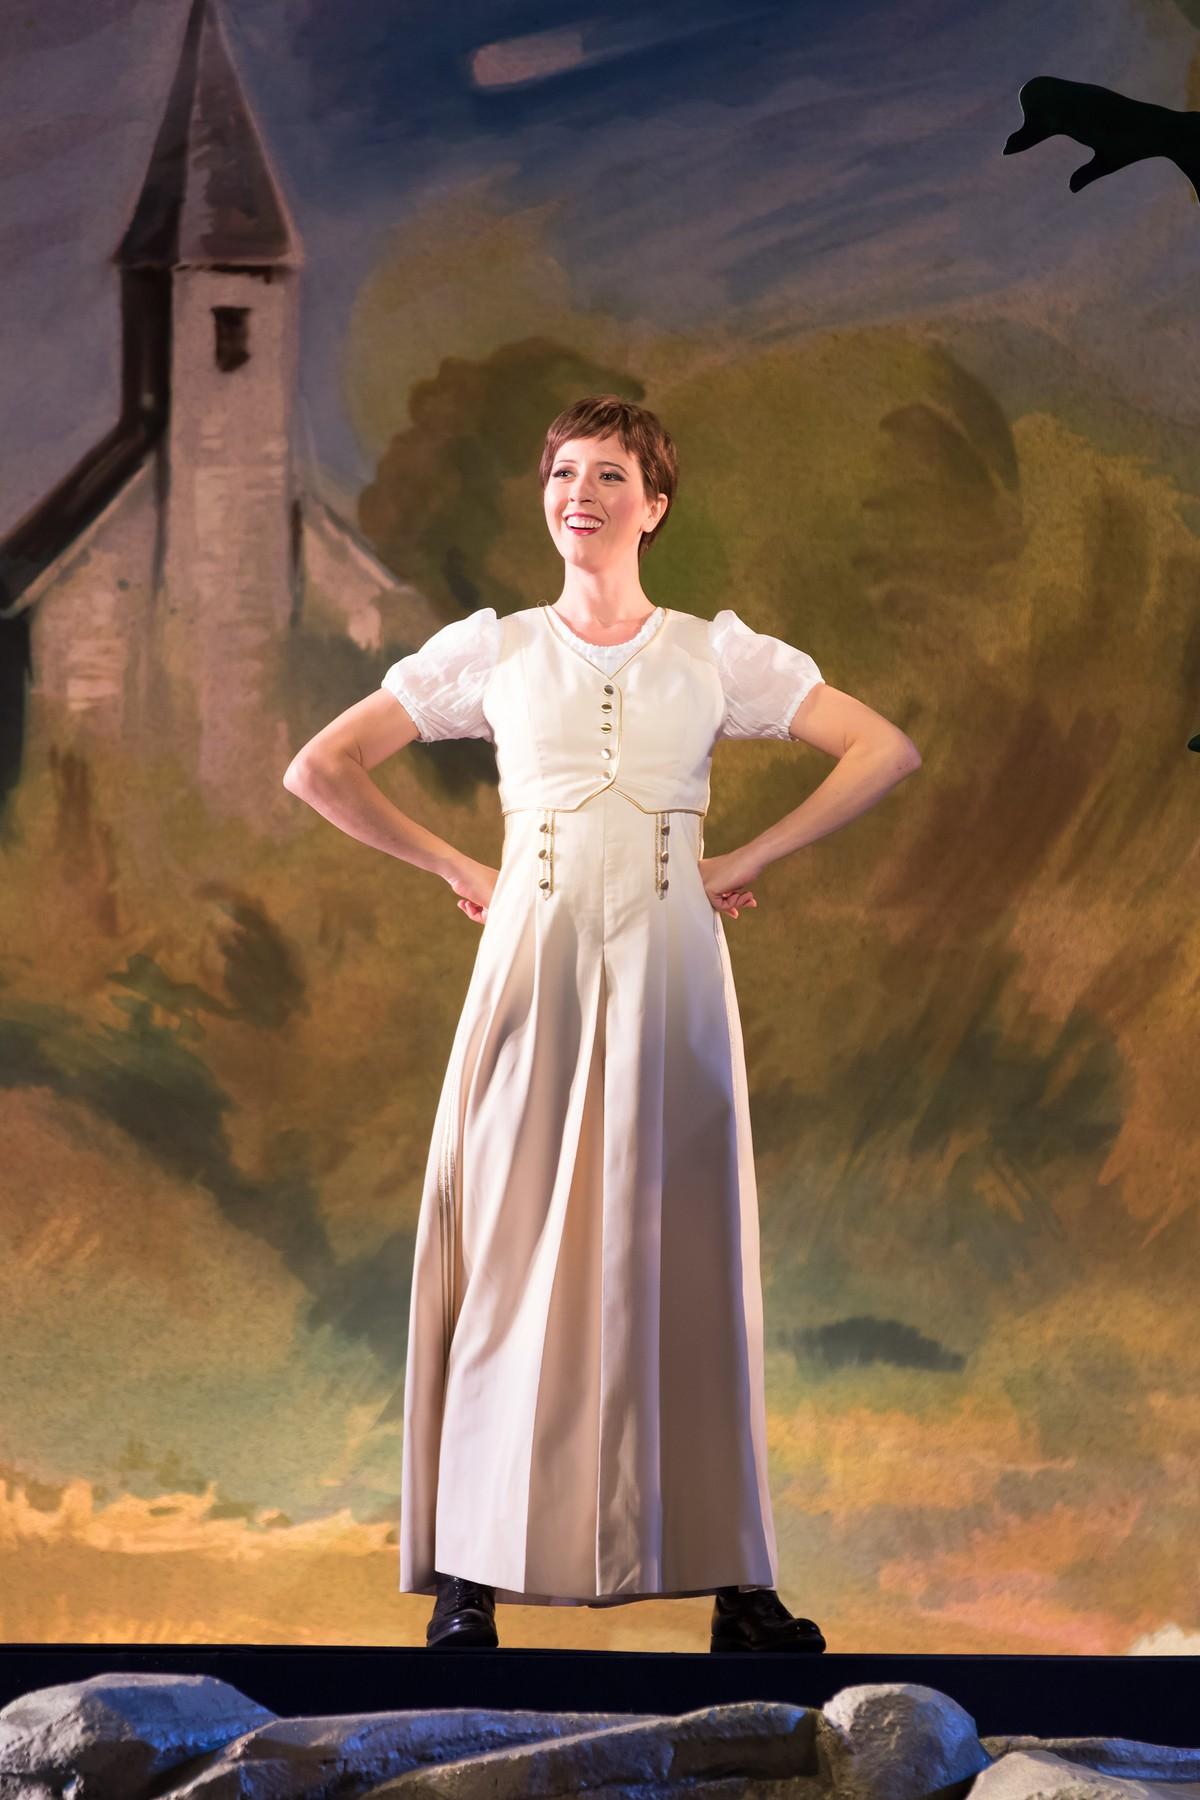 Lisette as Marie in Donizetti's  La fille du Regiment  at Washington National Opera.